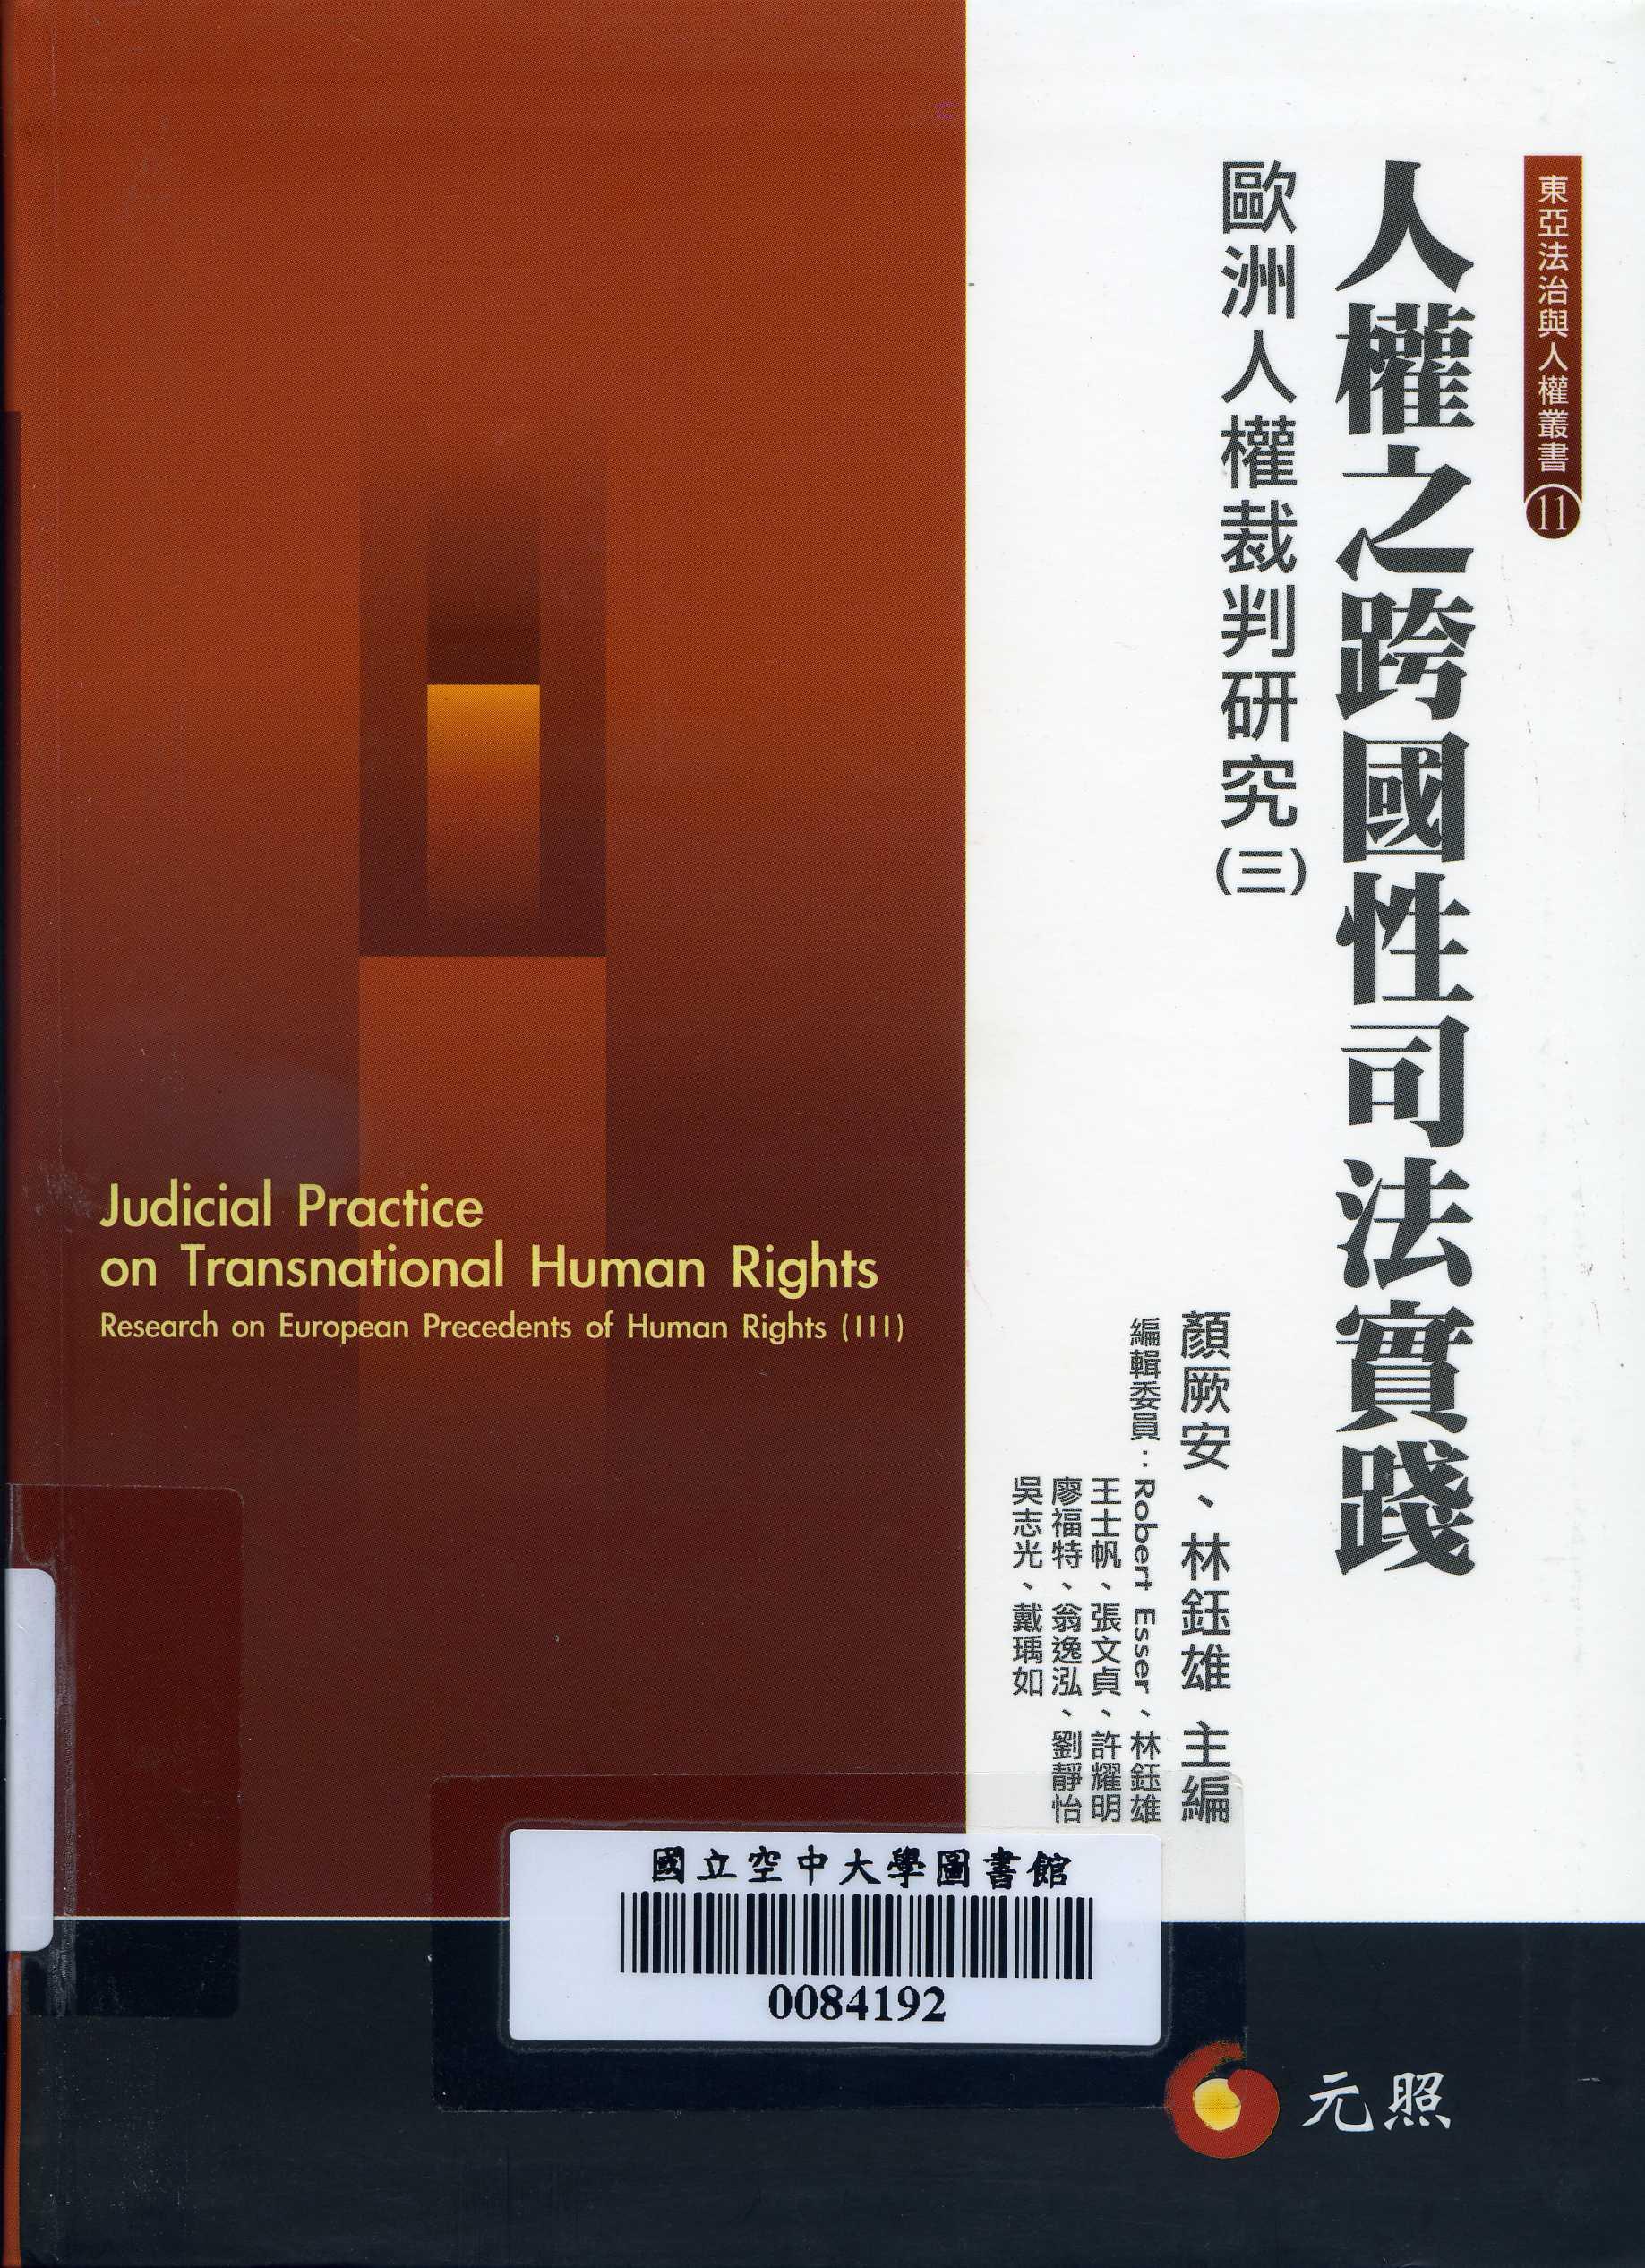 人權之跨國性司法實踐 : 歐洲人權裁判研究 = aJudicial practice on transnational human rights : research on European precedents of human rights.